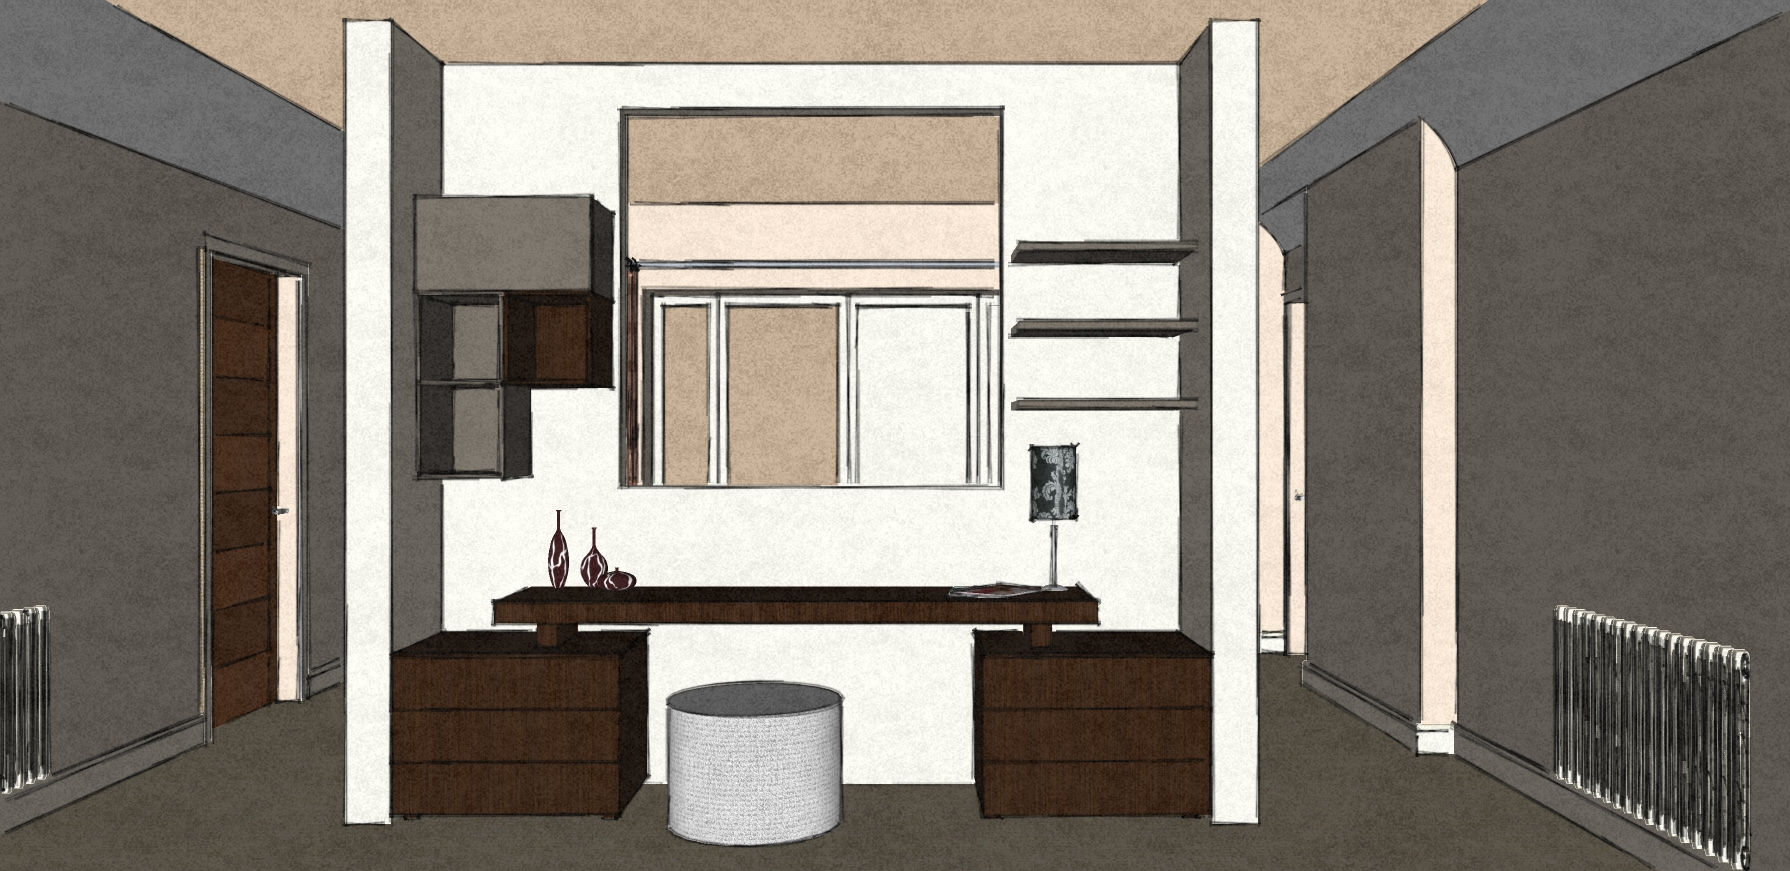 Sarah and Ed initial bedroom design a elevation j.jpg